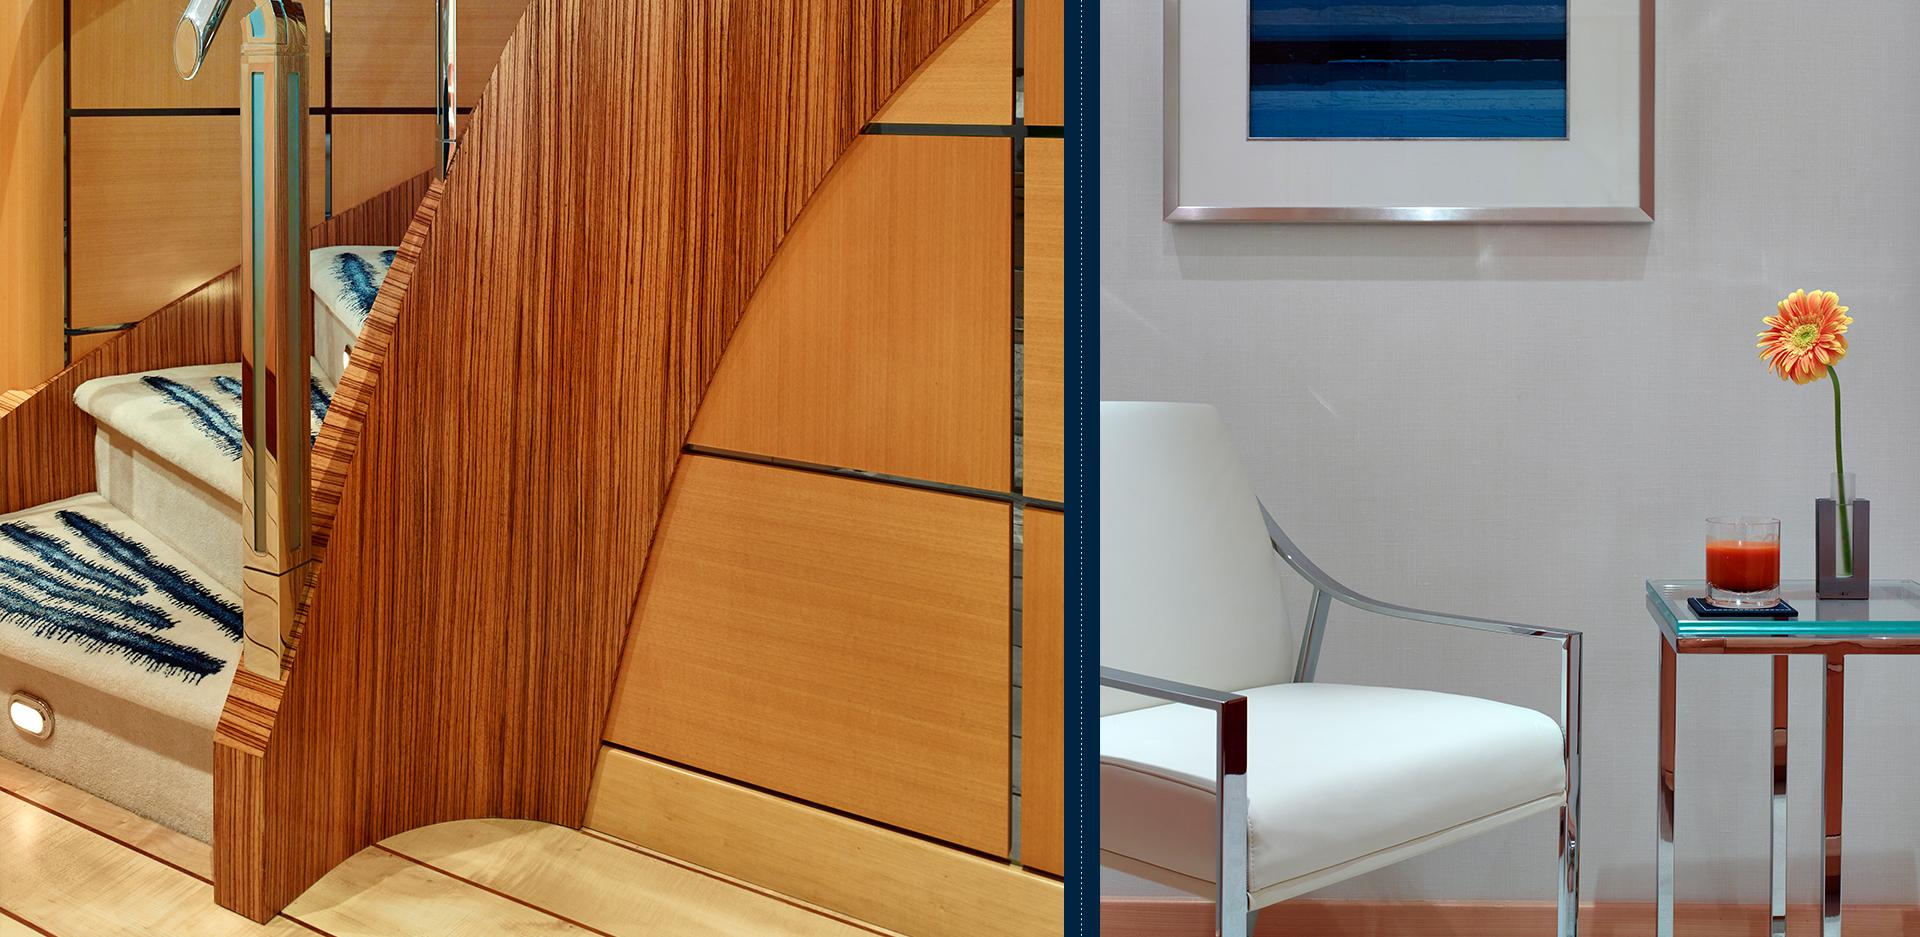 Lower Deck - Foyer